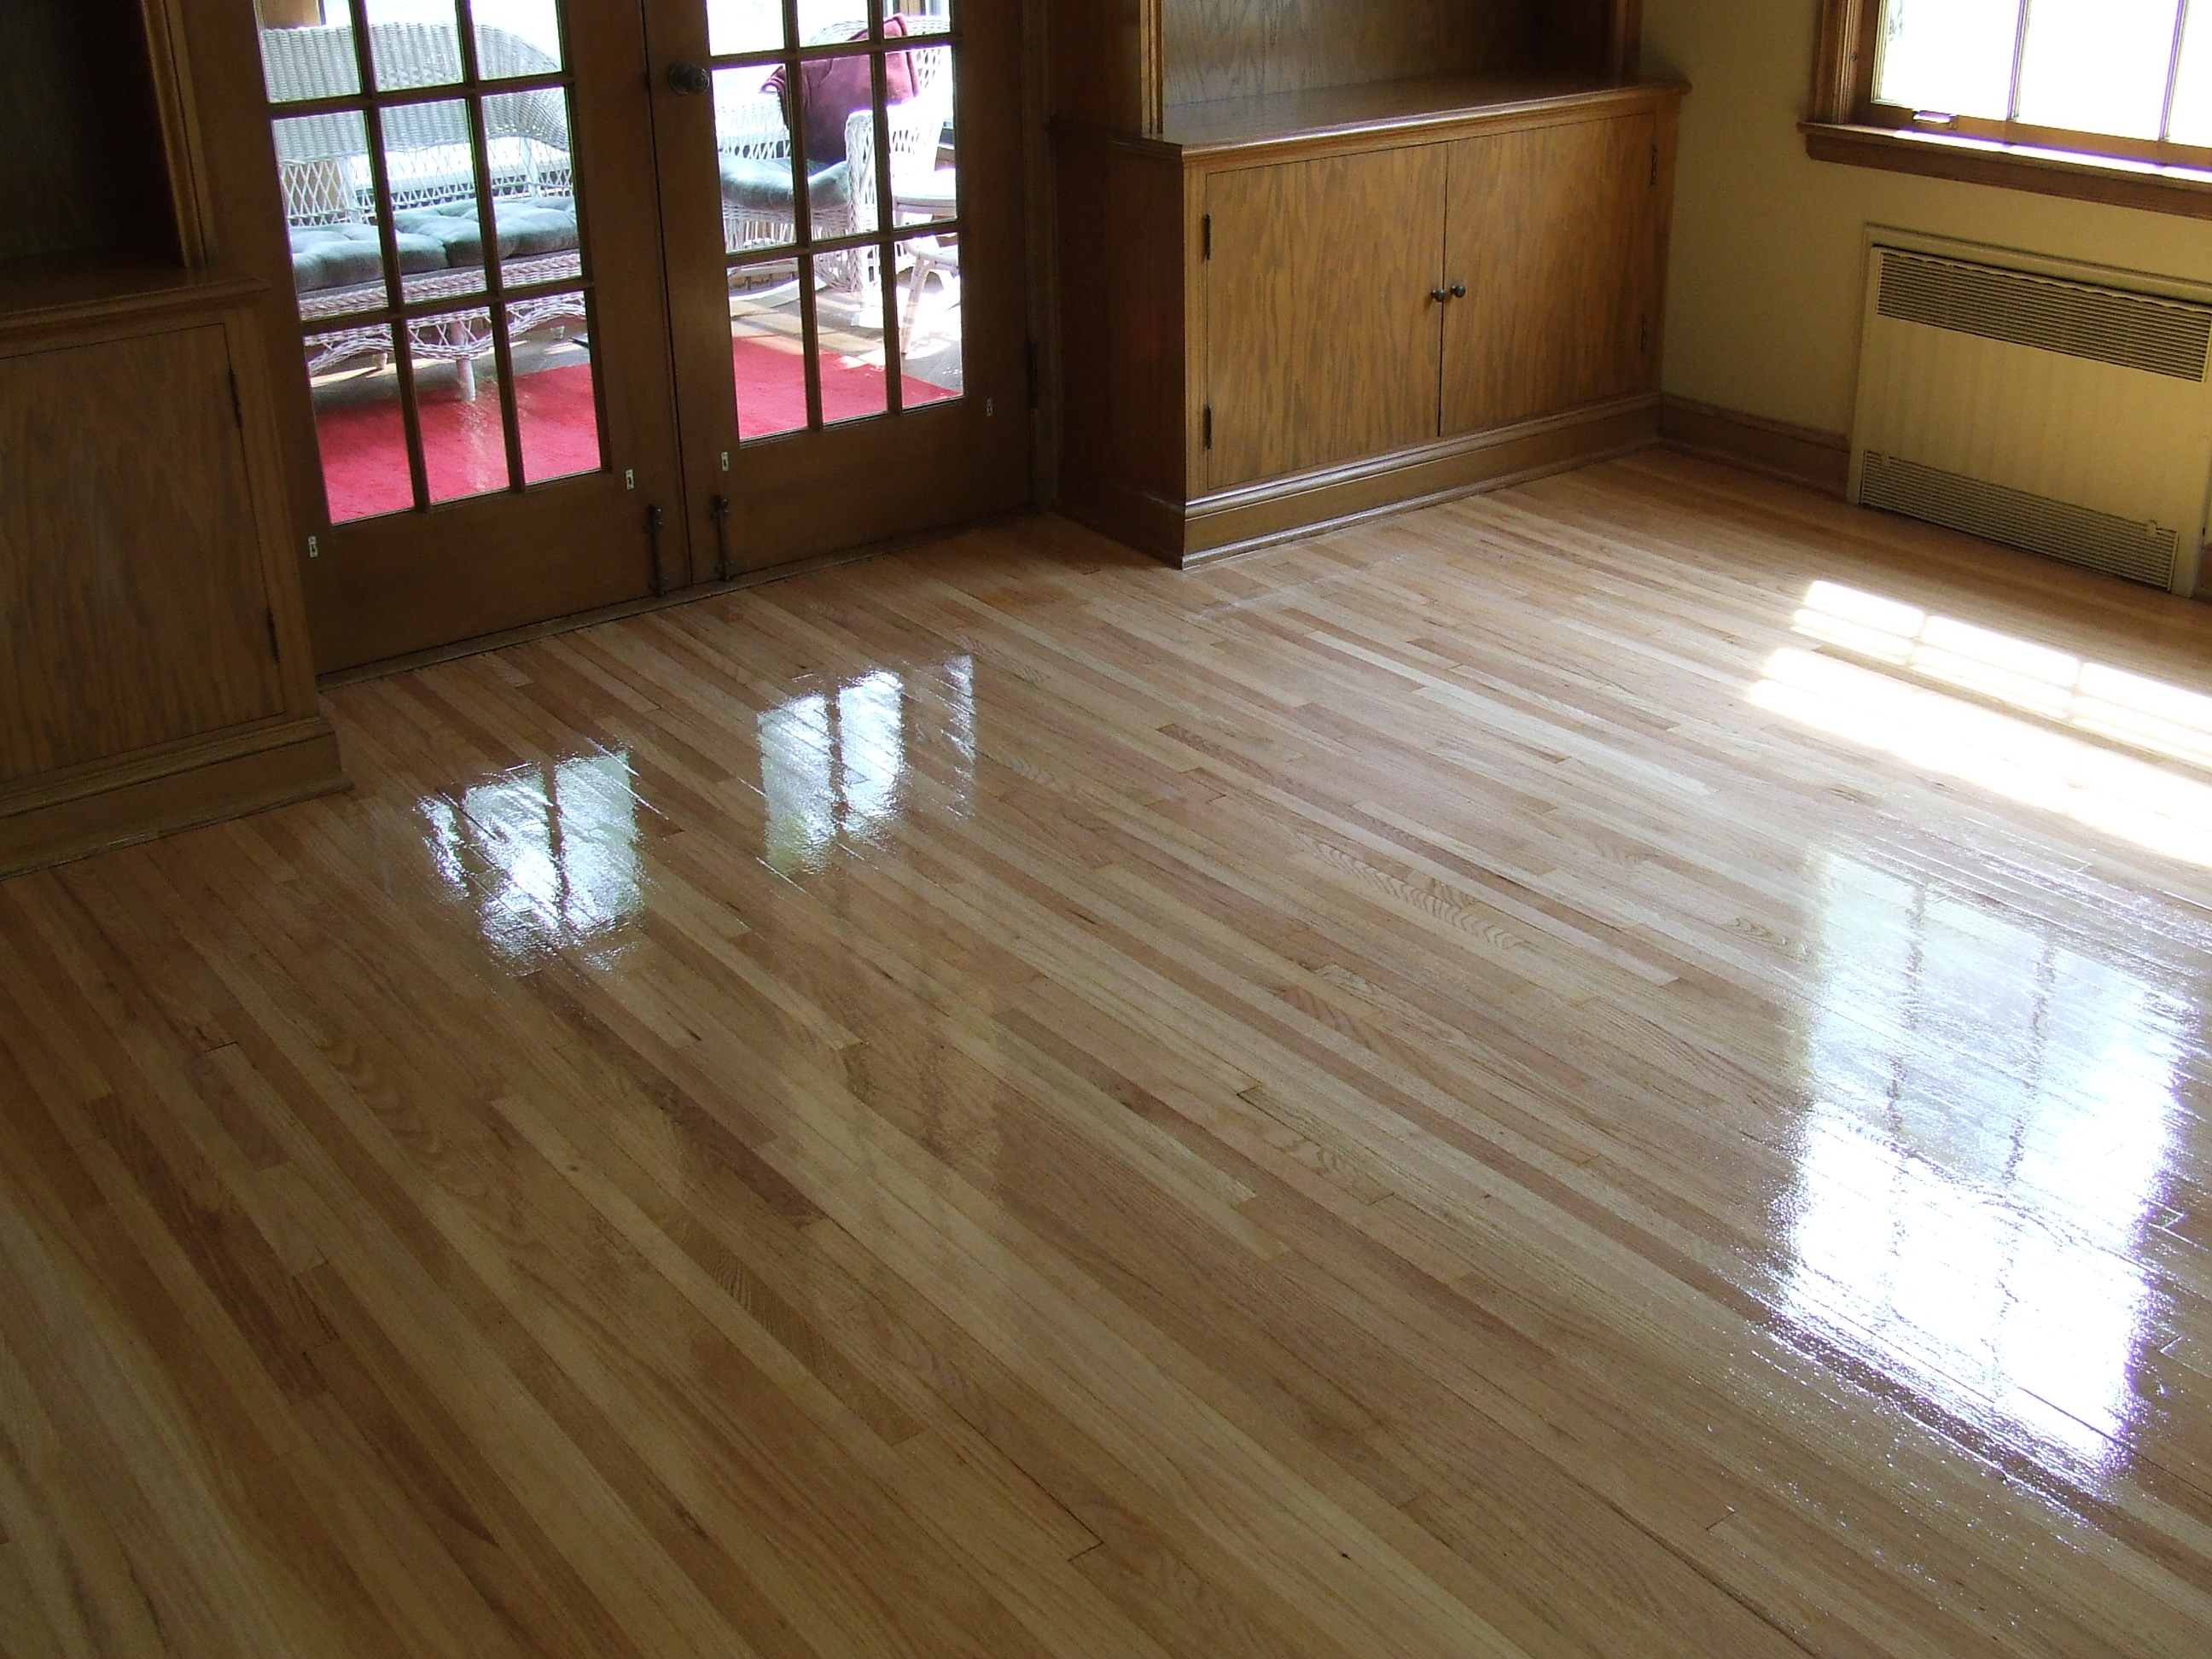 Most Durable Hardwood Floors laminate wood flooring durability. the luxury of laminate flooring